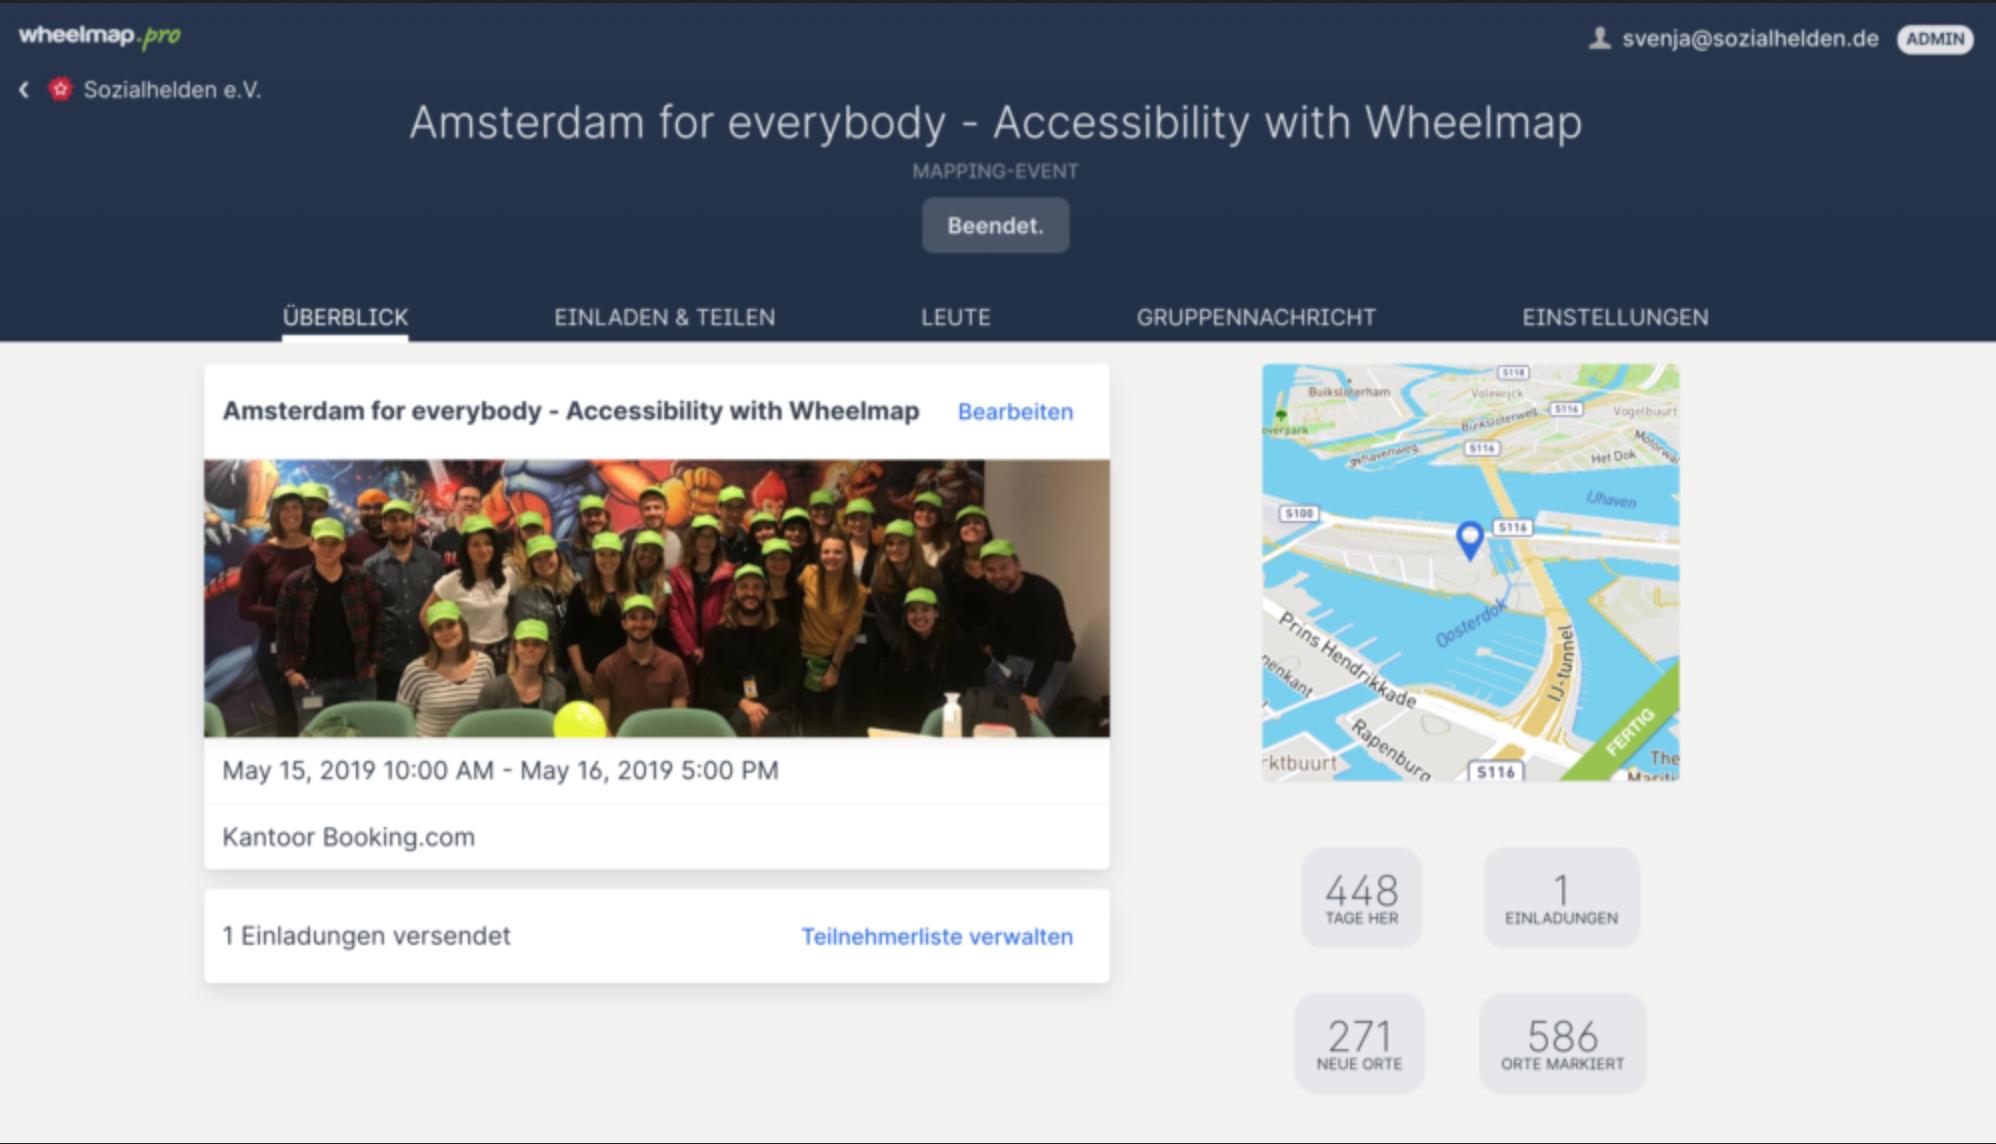 Screenshot des Mapping-Event Planners zur Mapping-Aktion von Booking.com in Amsterdam im Mai 2019